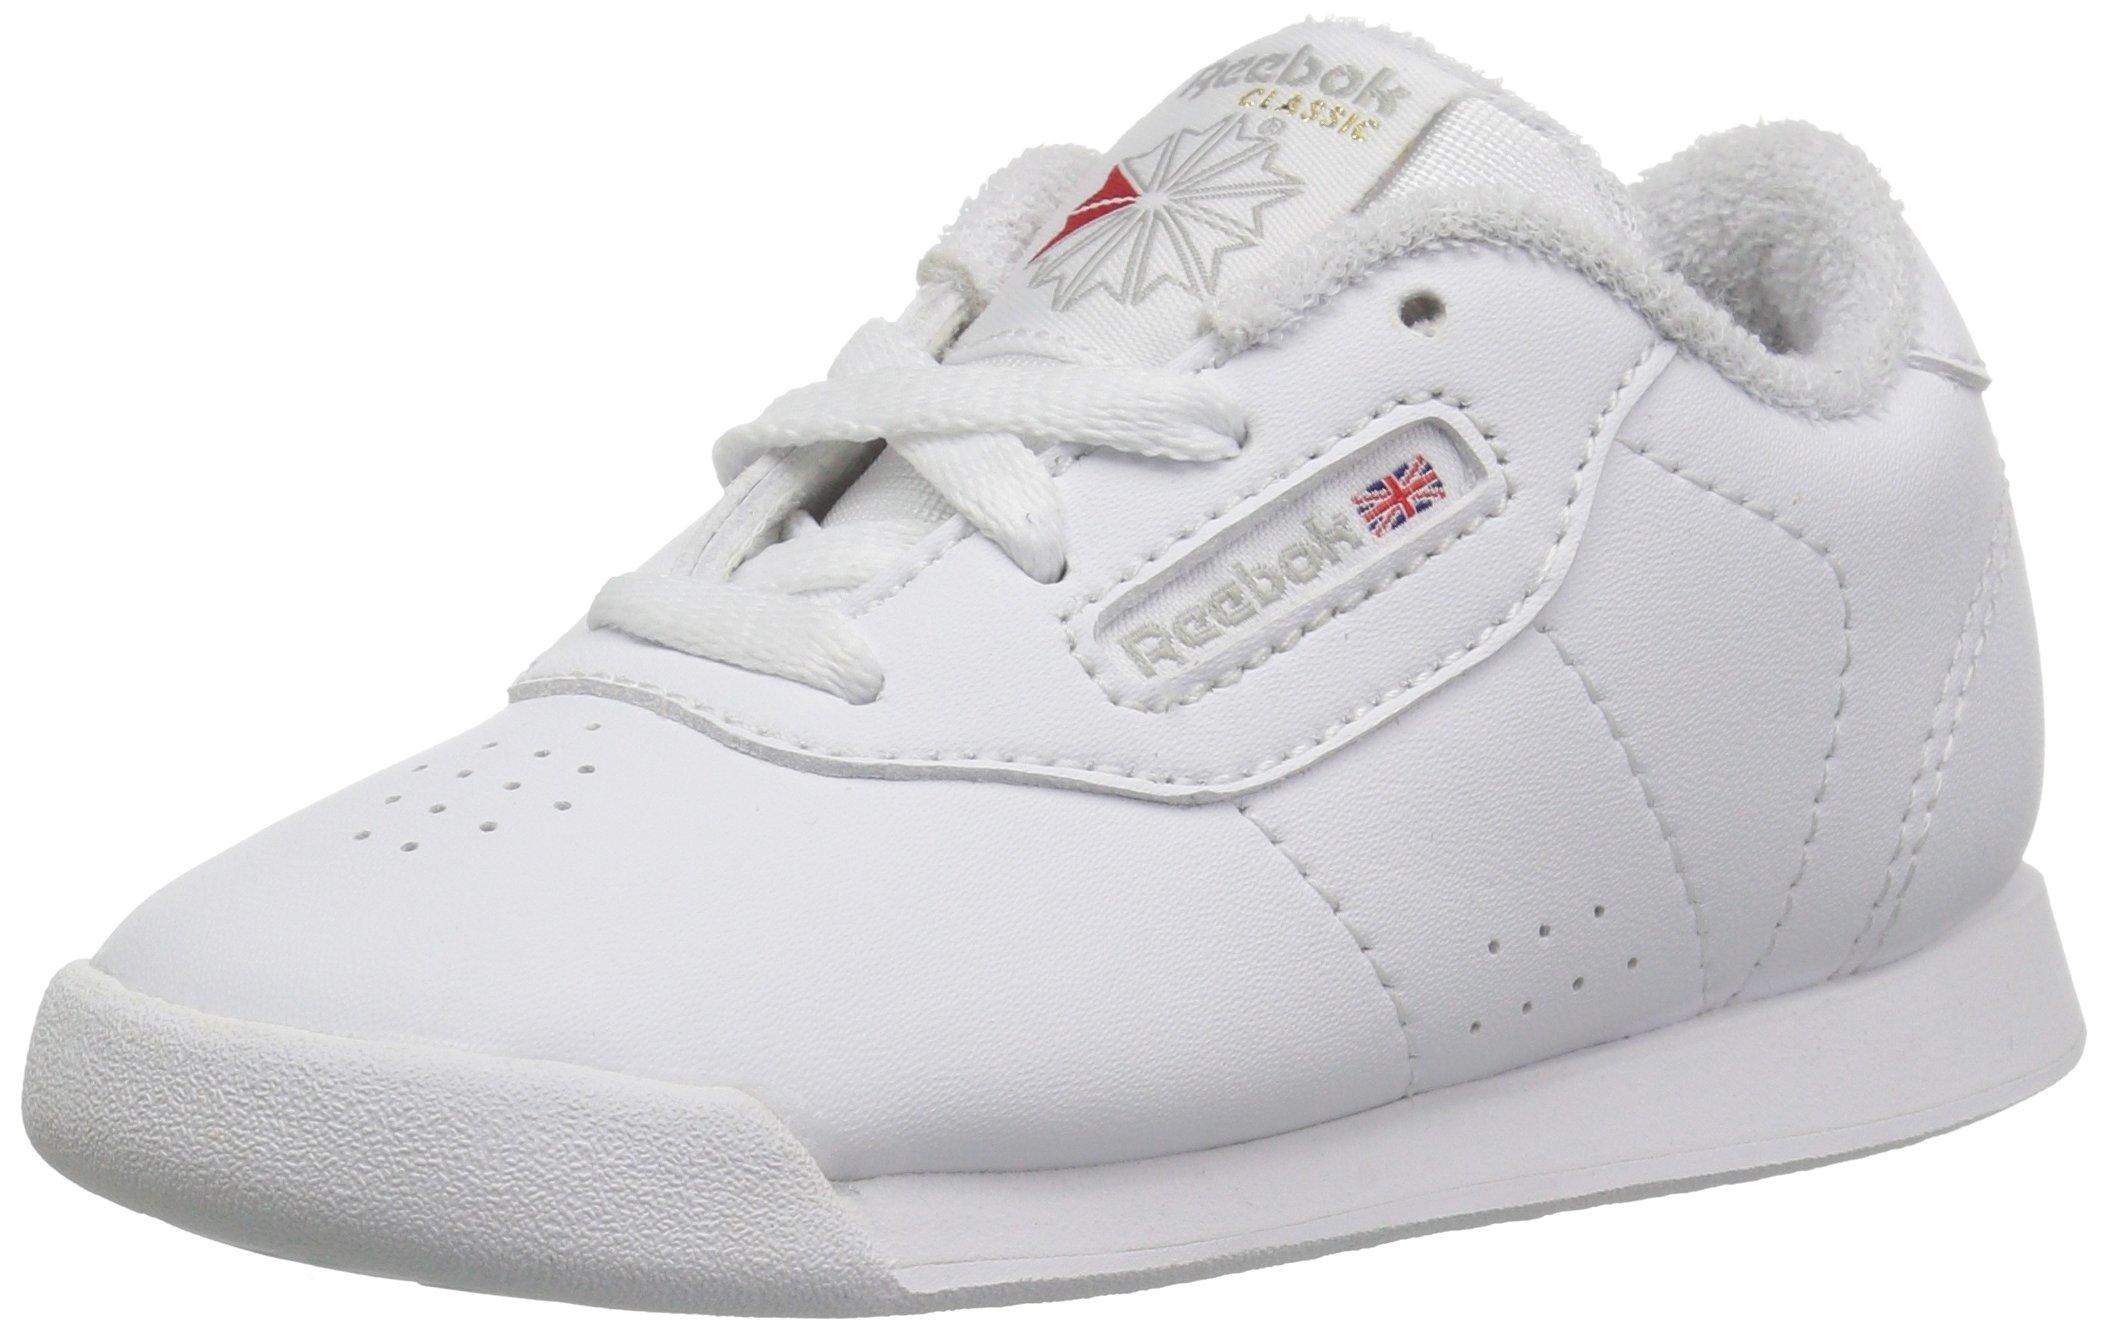 Reebok Unisex Princess Sneaker, White/Grey, 12.5 M US Little Kid